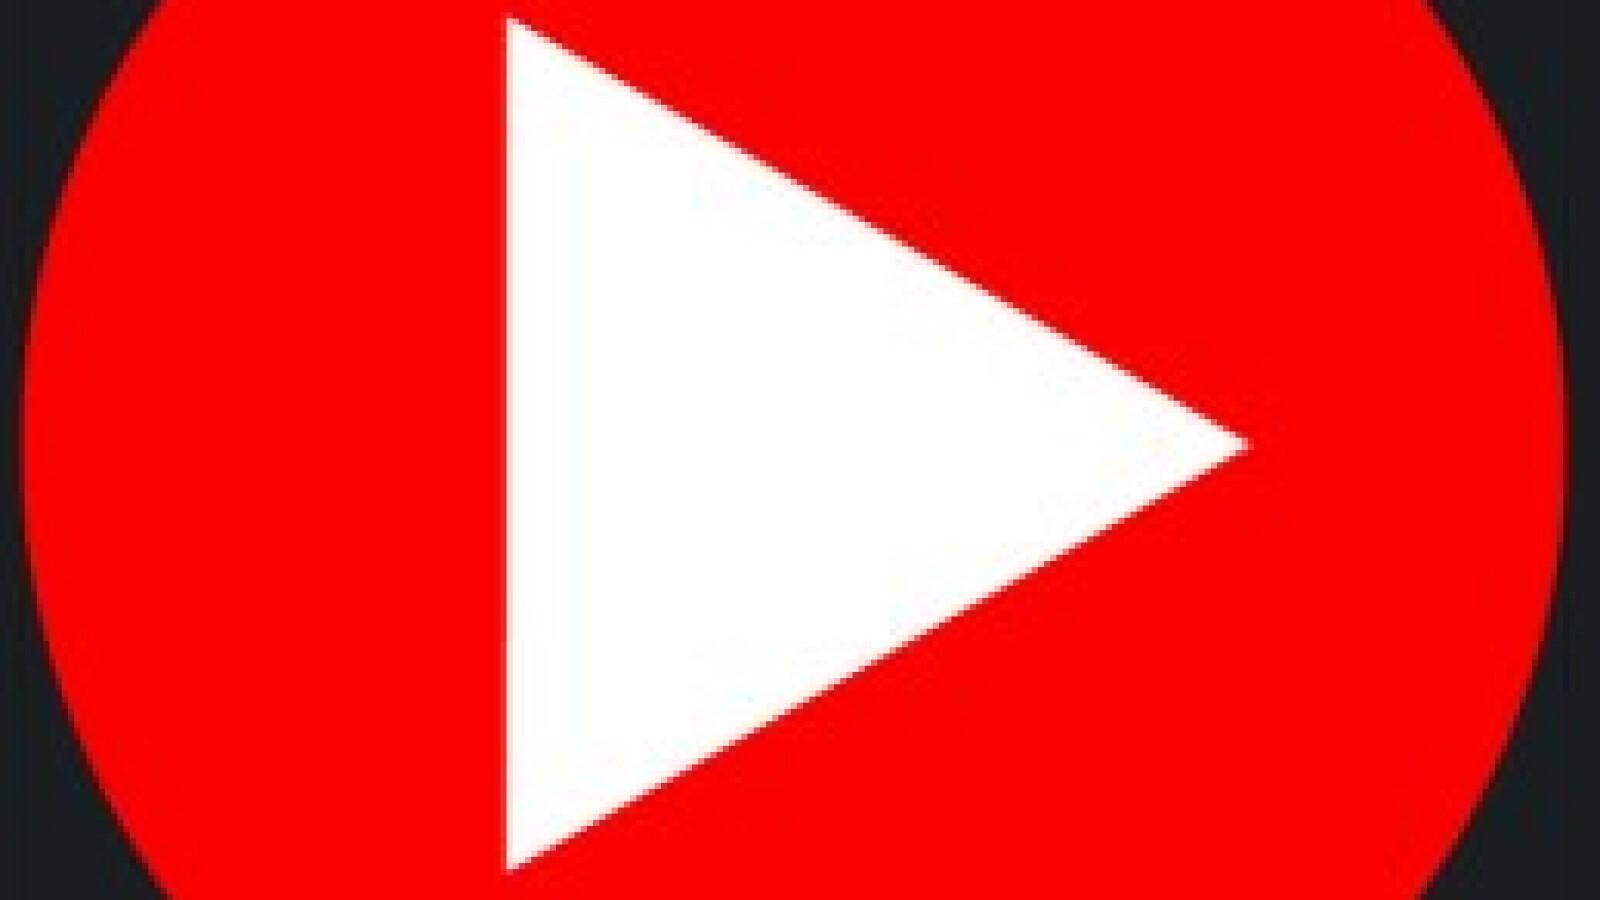 App runterladen youtube Get YouTube